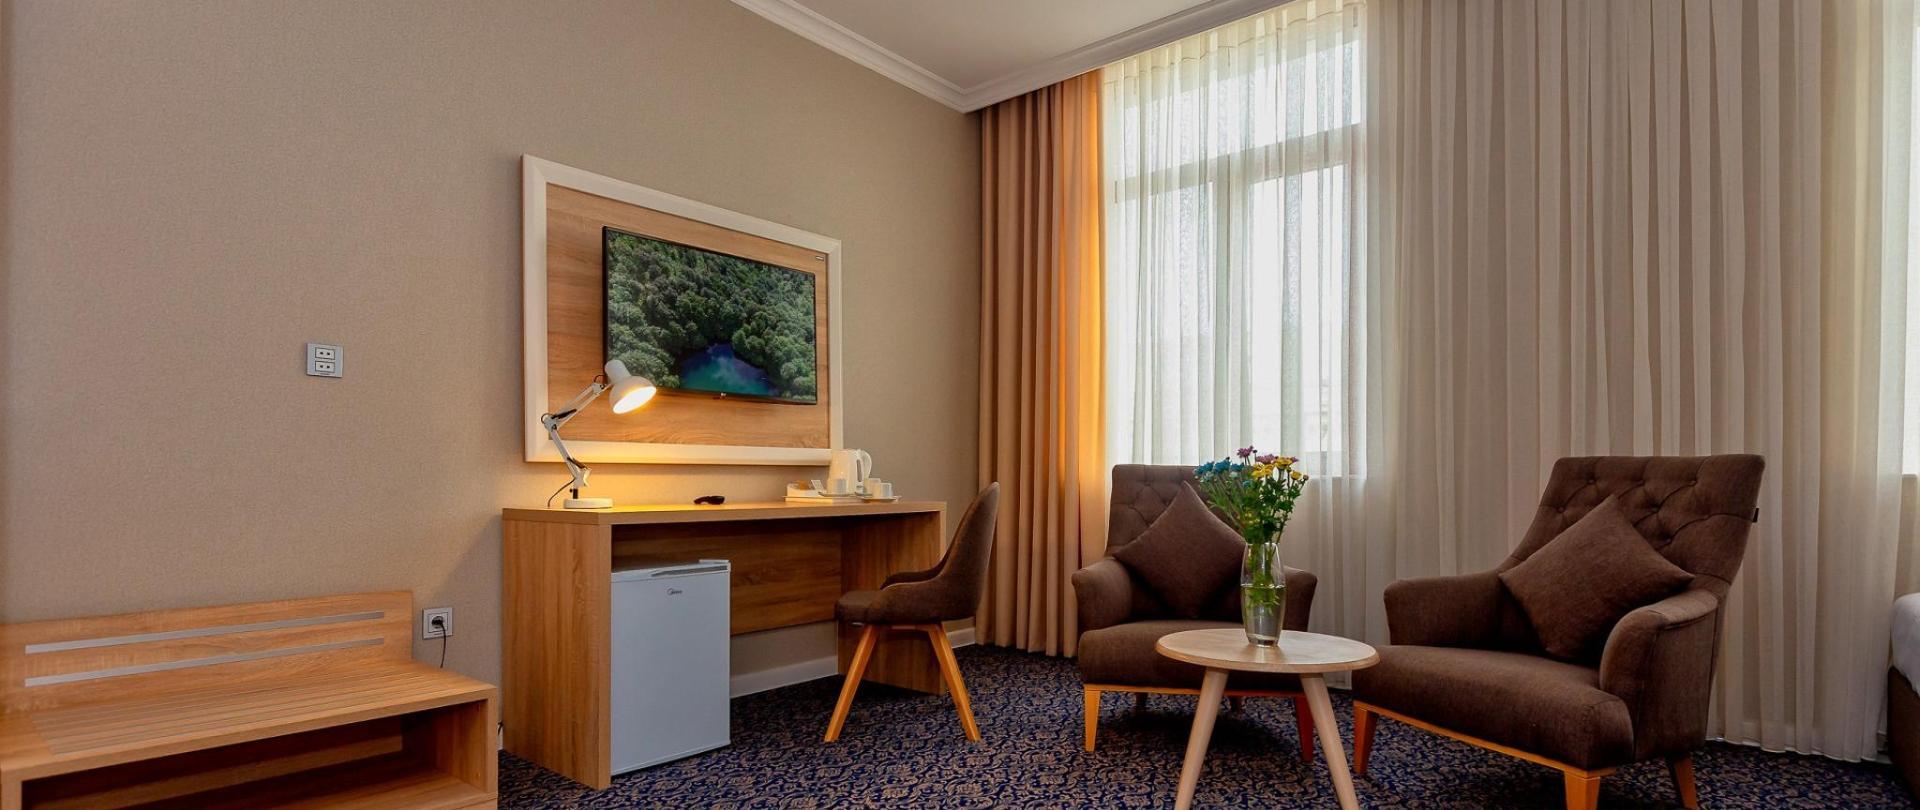 Metrocity Hotel-5.jpg